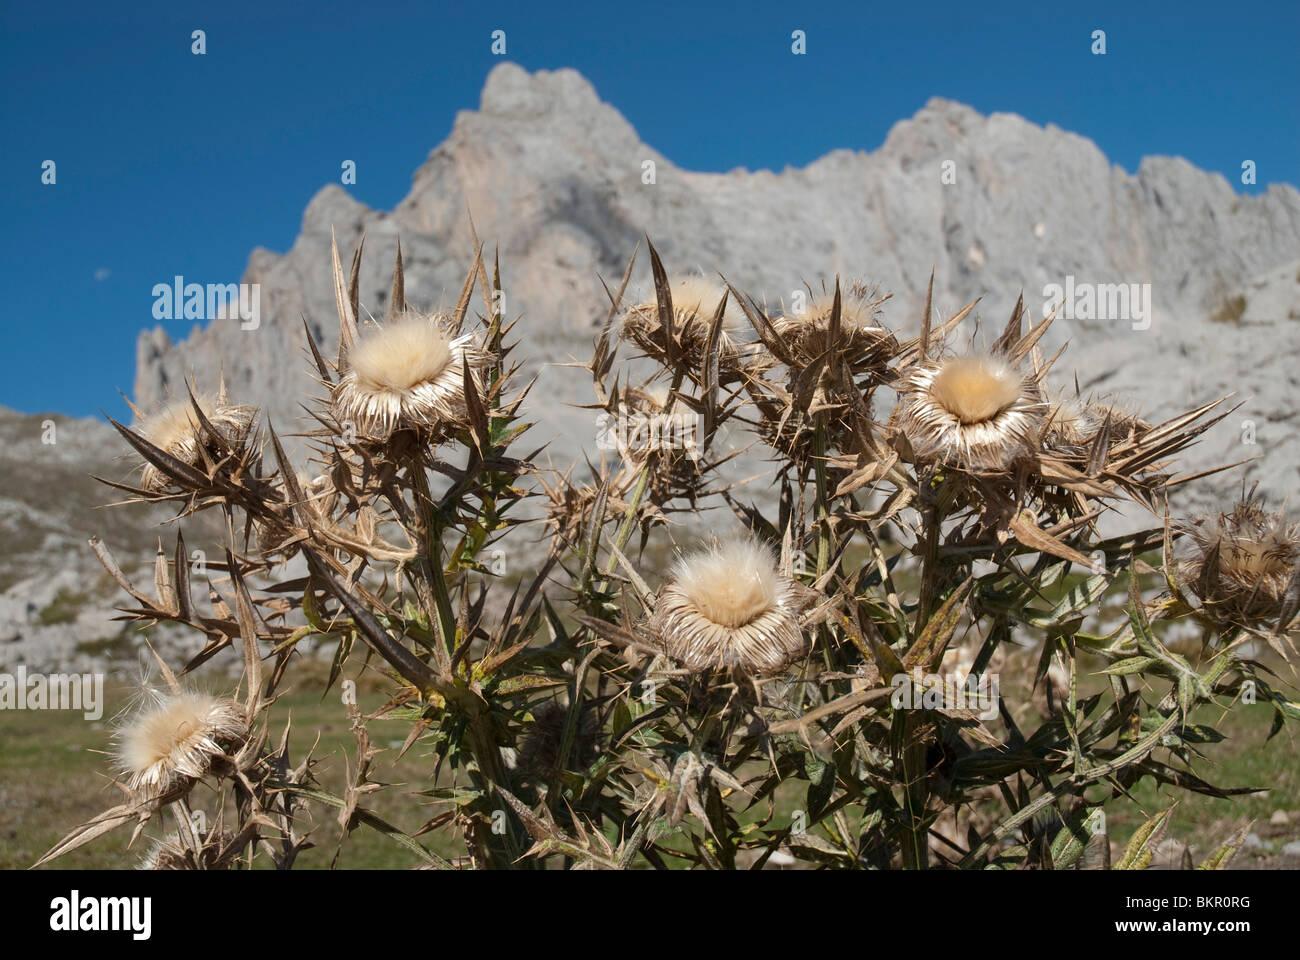 Picos de Europa, Northern Spain - Stock Image